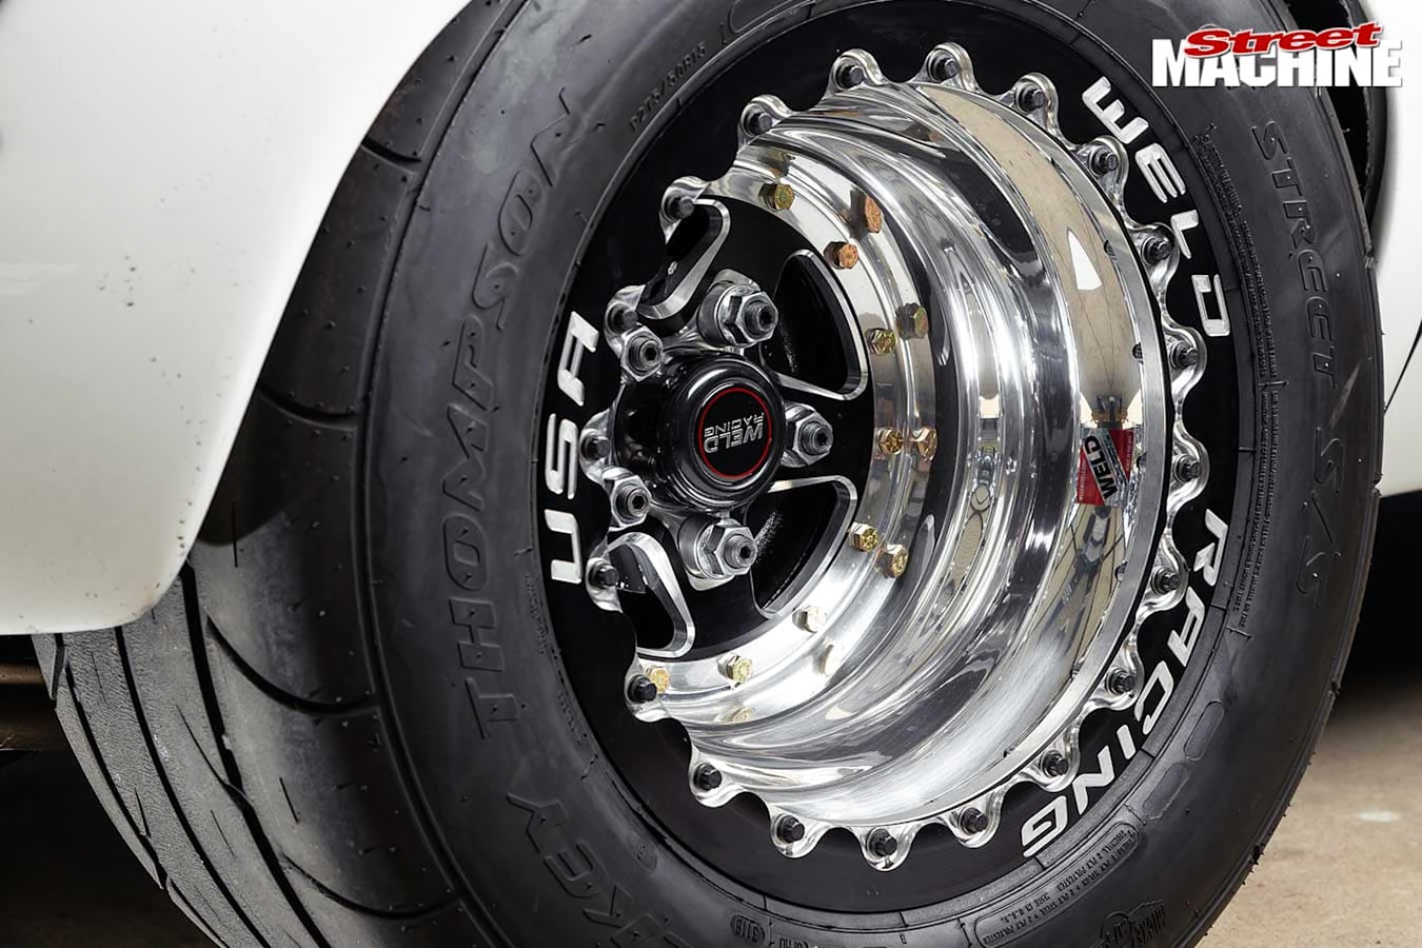 Holden Torana LX SS wheel